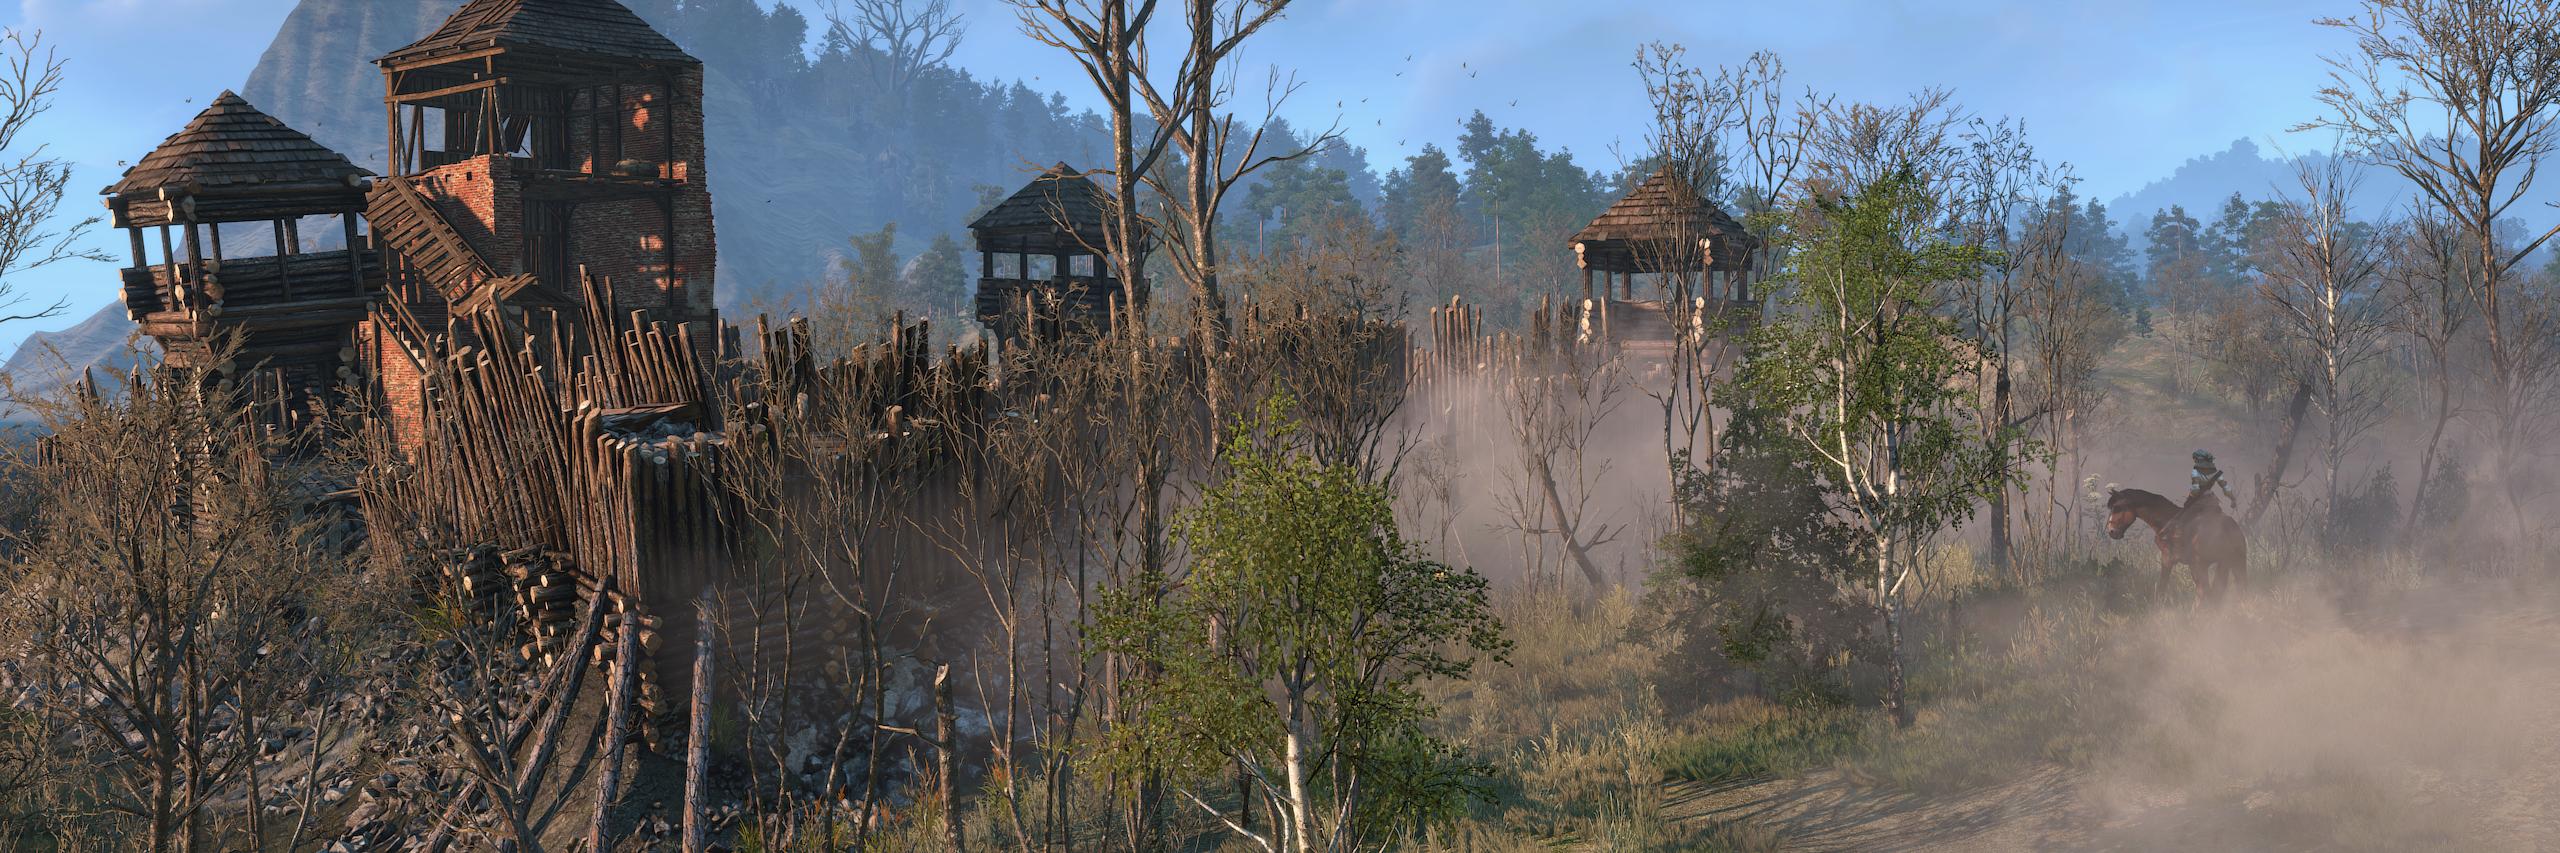 defencesdown.png - Witcher 3: Wild Hunt, the